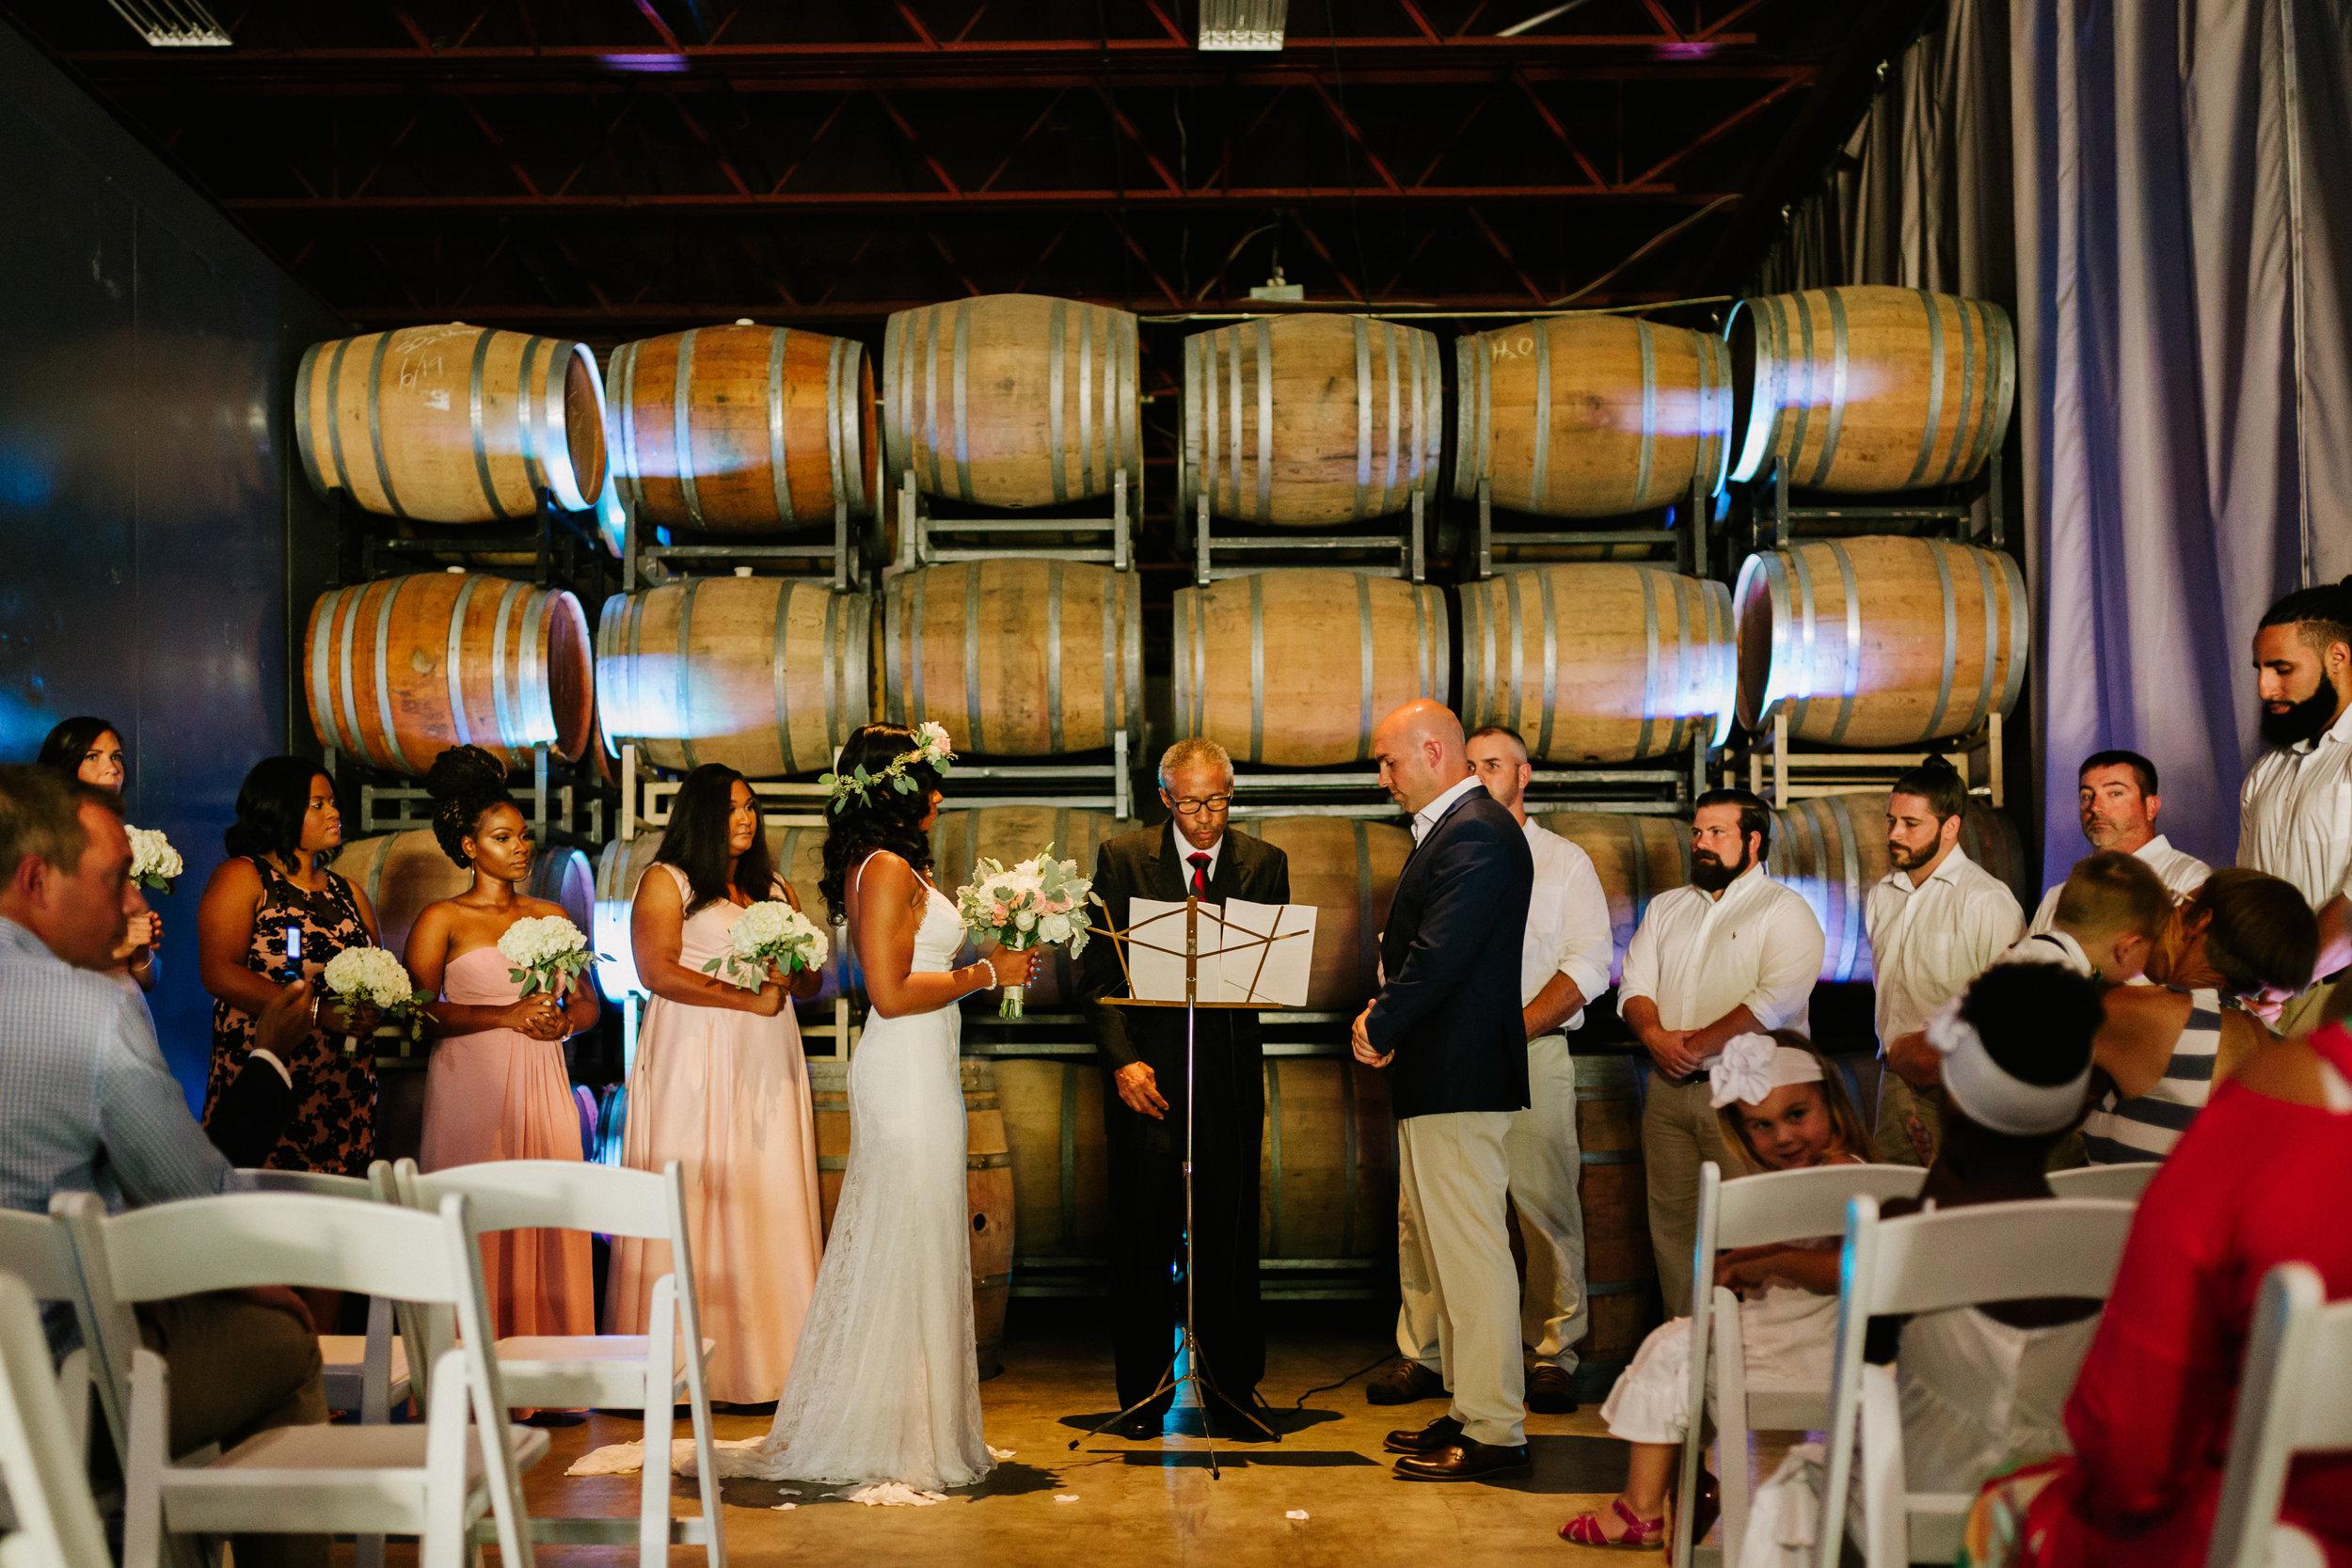 2017.09.16 Ashley and Chuck O'Day Quantam Leap Winery Wedding (161 of 462).jpg